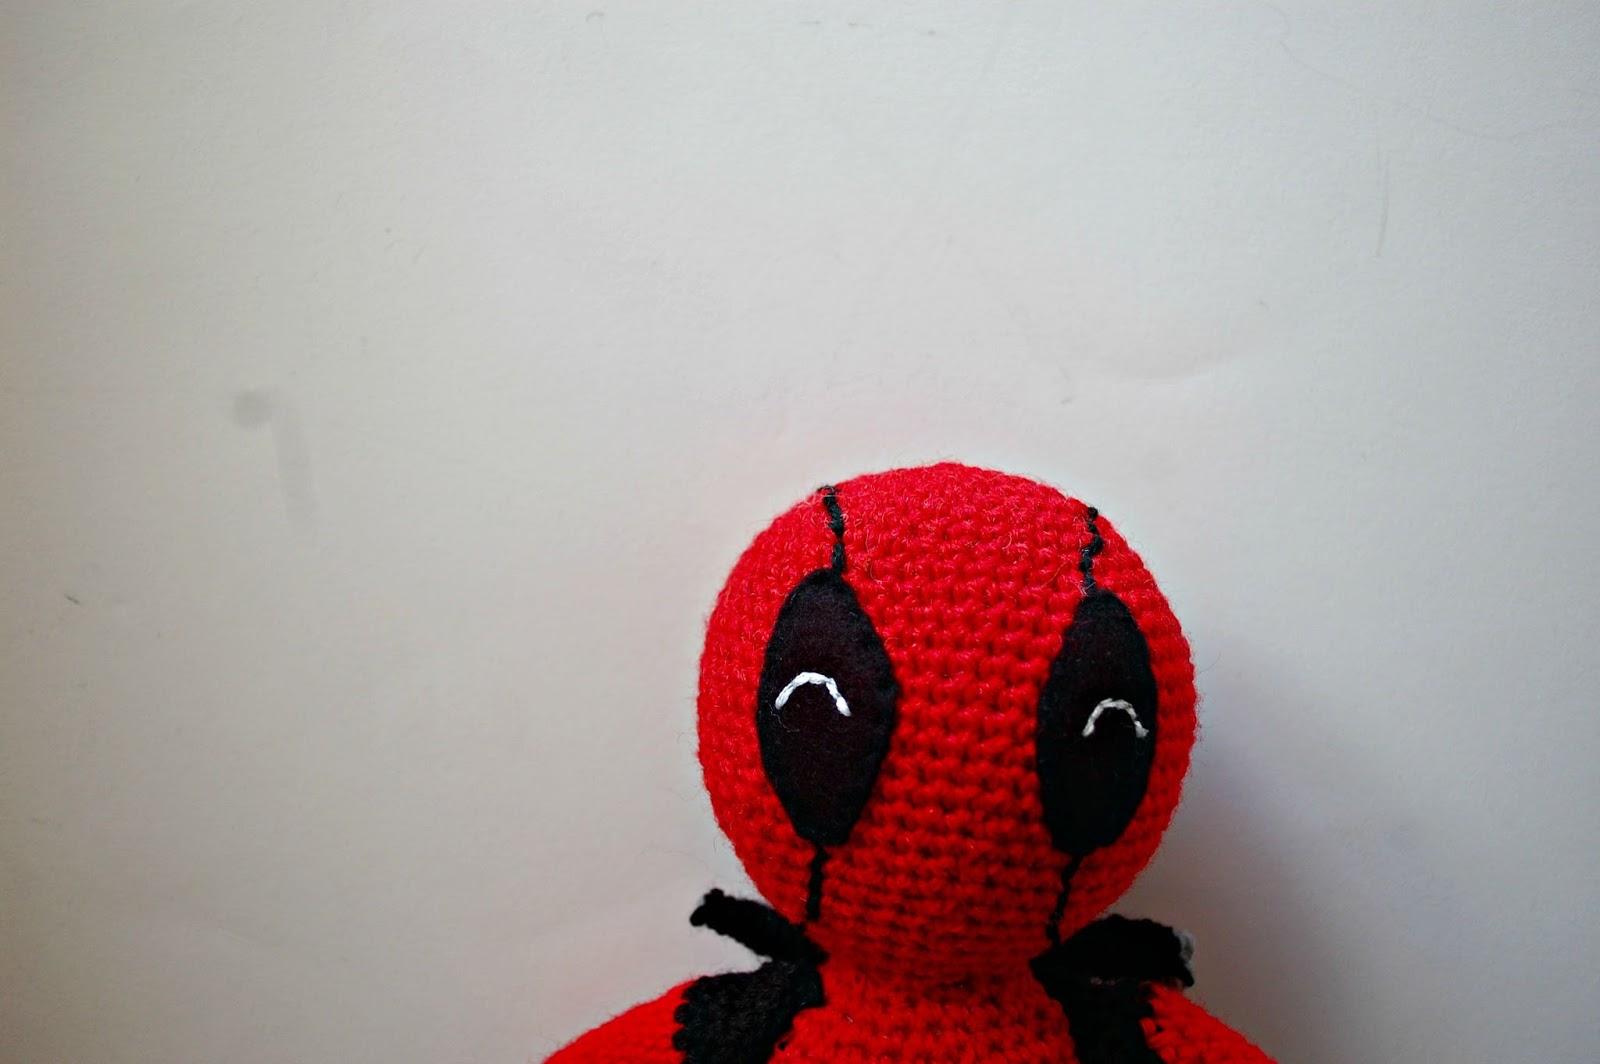 Deadpool amigurumi Crochet pattern by Lenn's Craft | 1064x1600